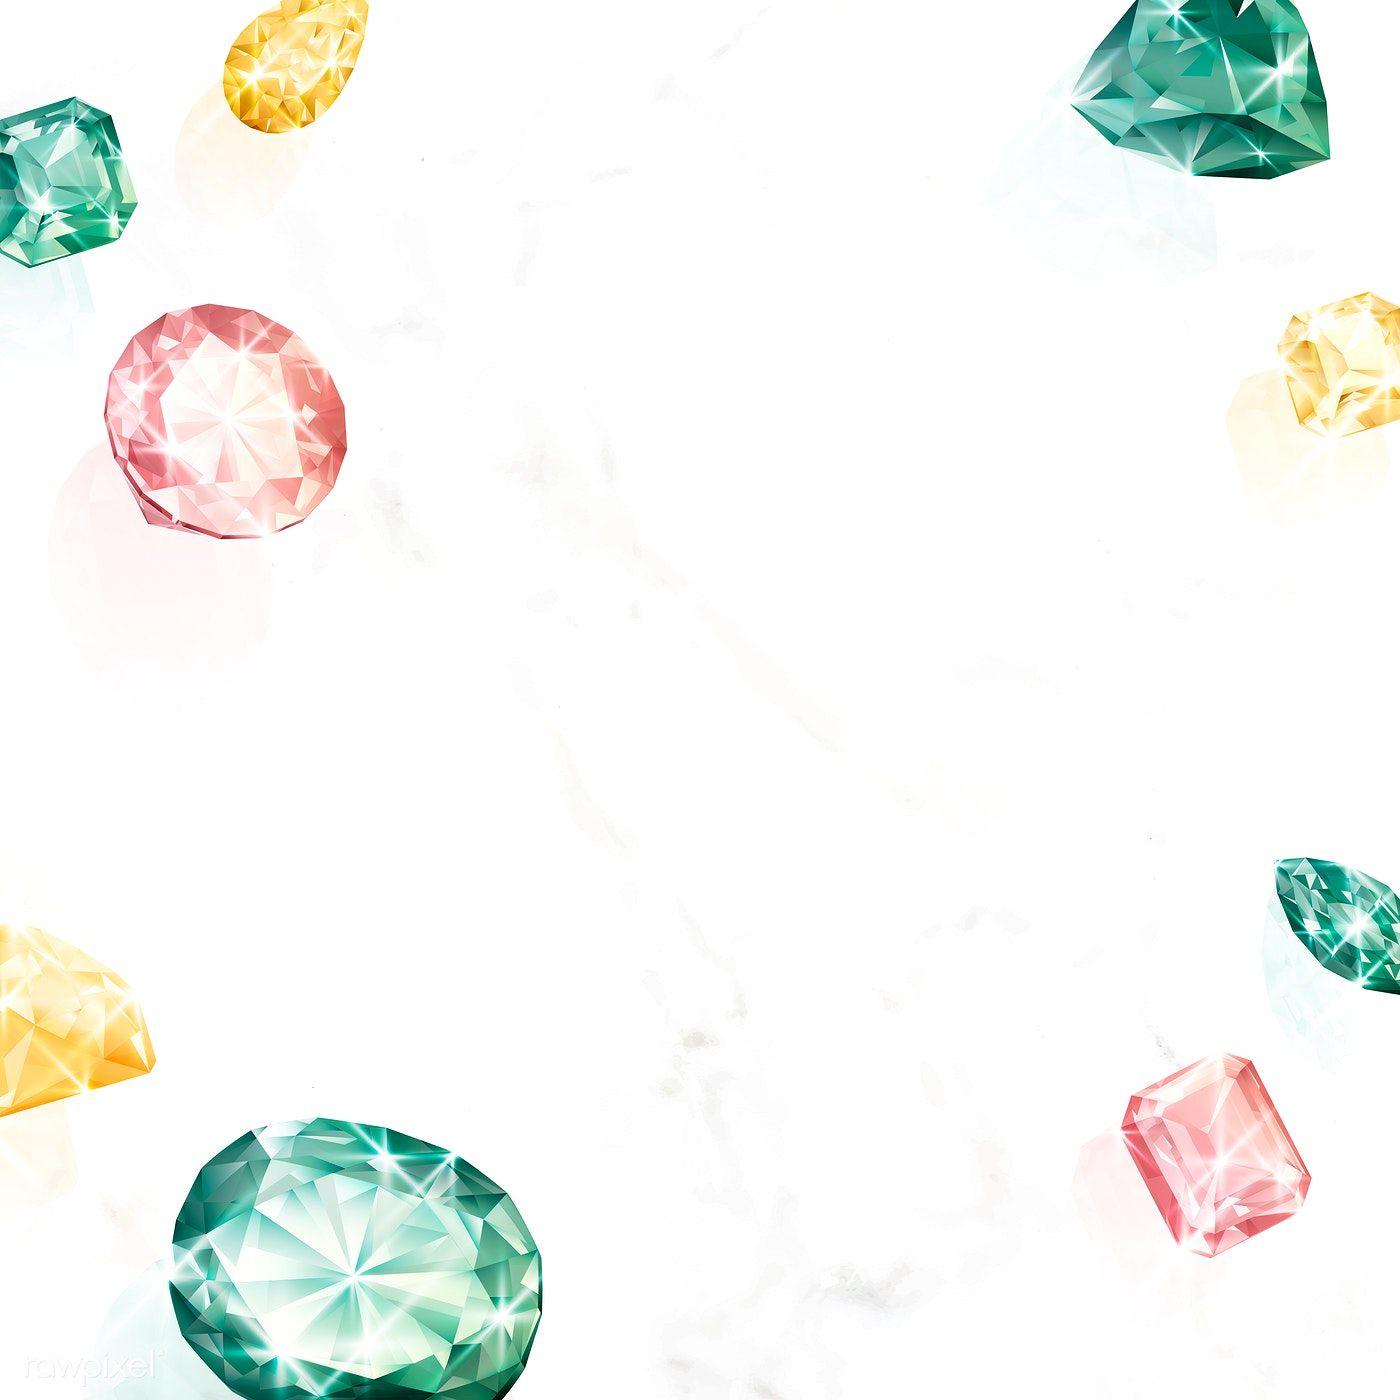 Colorful Crystal Gem Design Vector Premium Image By Rawpixel Com Aew Crystal Gems Crystals Medical Wallpaper